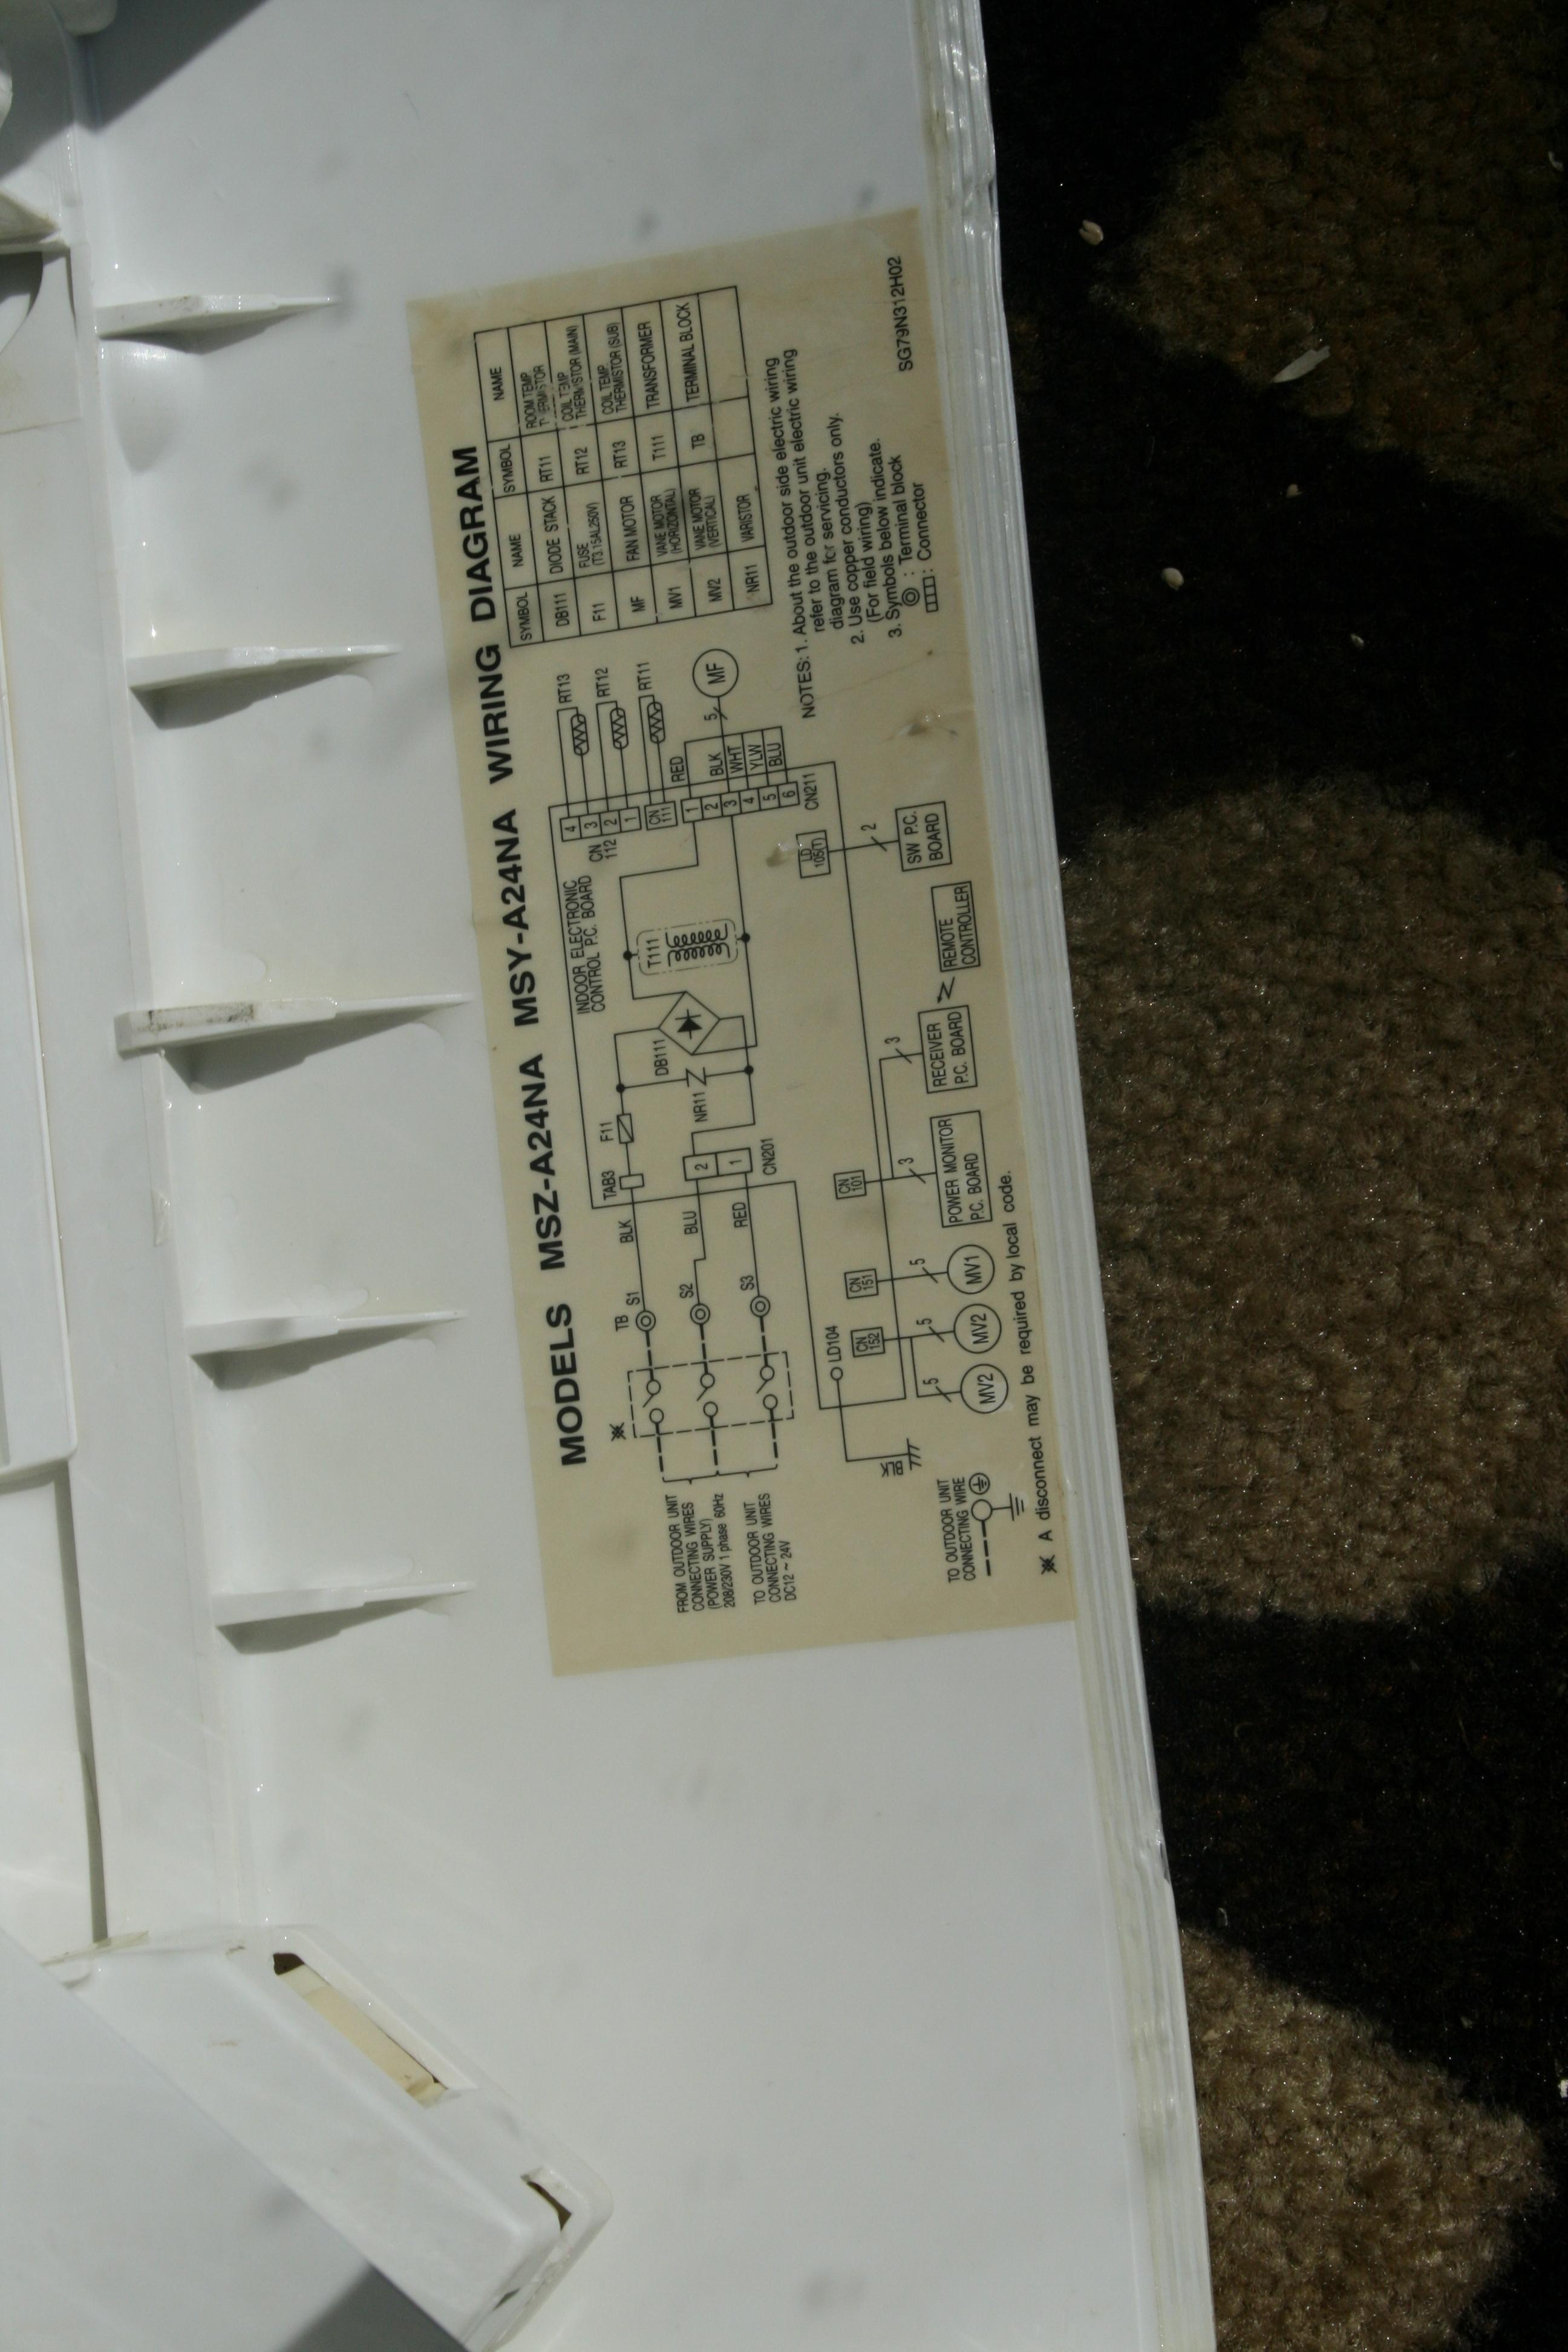 Index Of 8466 2010 Renovations Rick 07 23 Mitsubishi Msz Wiring Diagram Ac 2400 Diagr